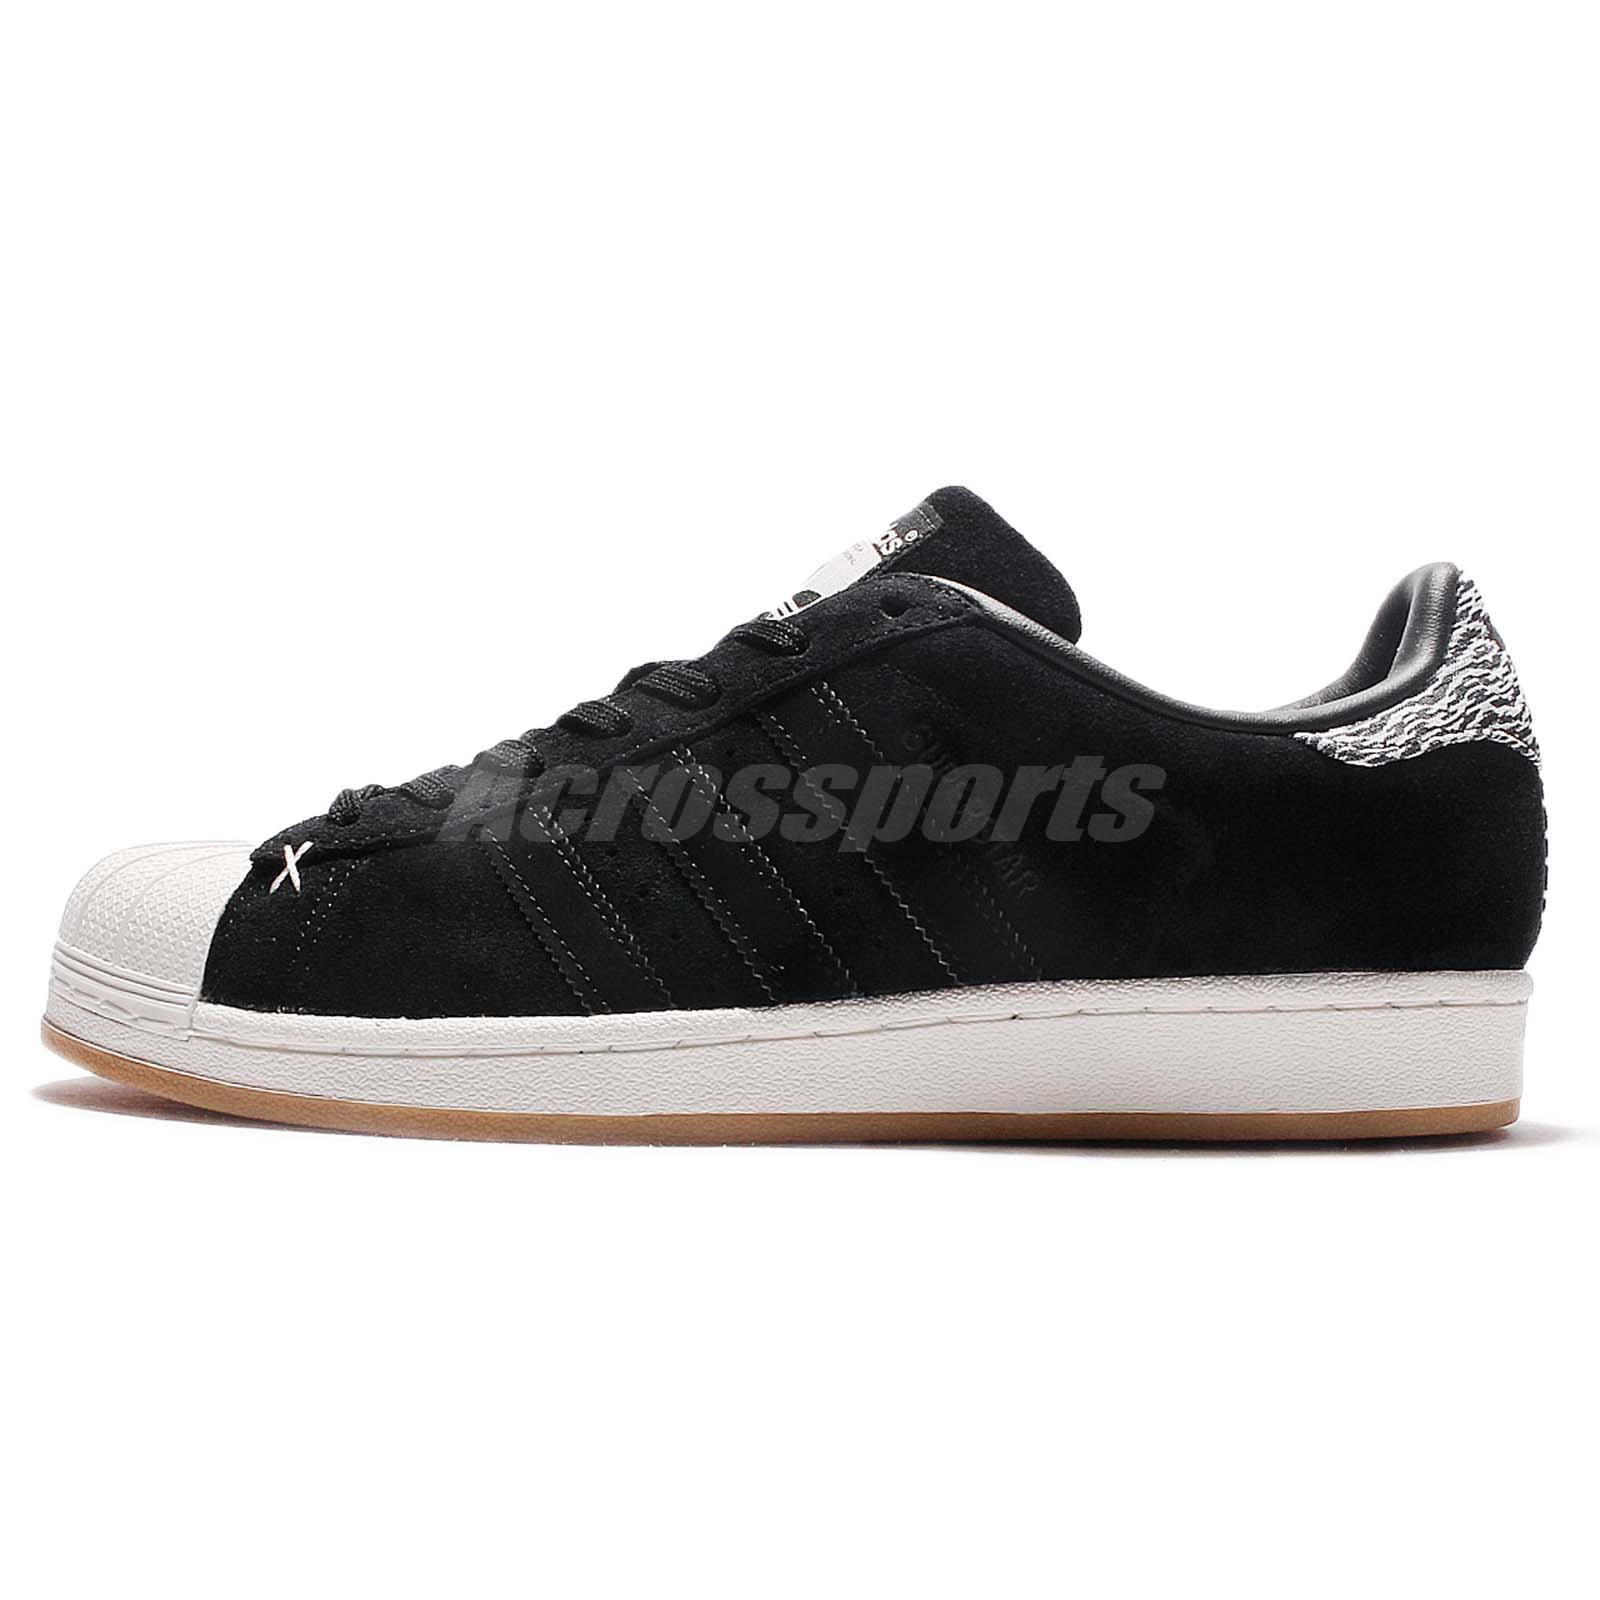 adidas Originals Superstar Black Off White Camo Men Casual Shoes Sneakers  B27737